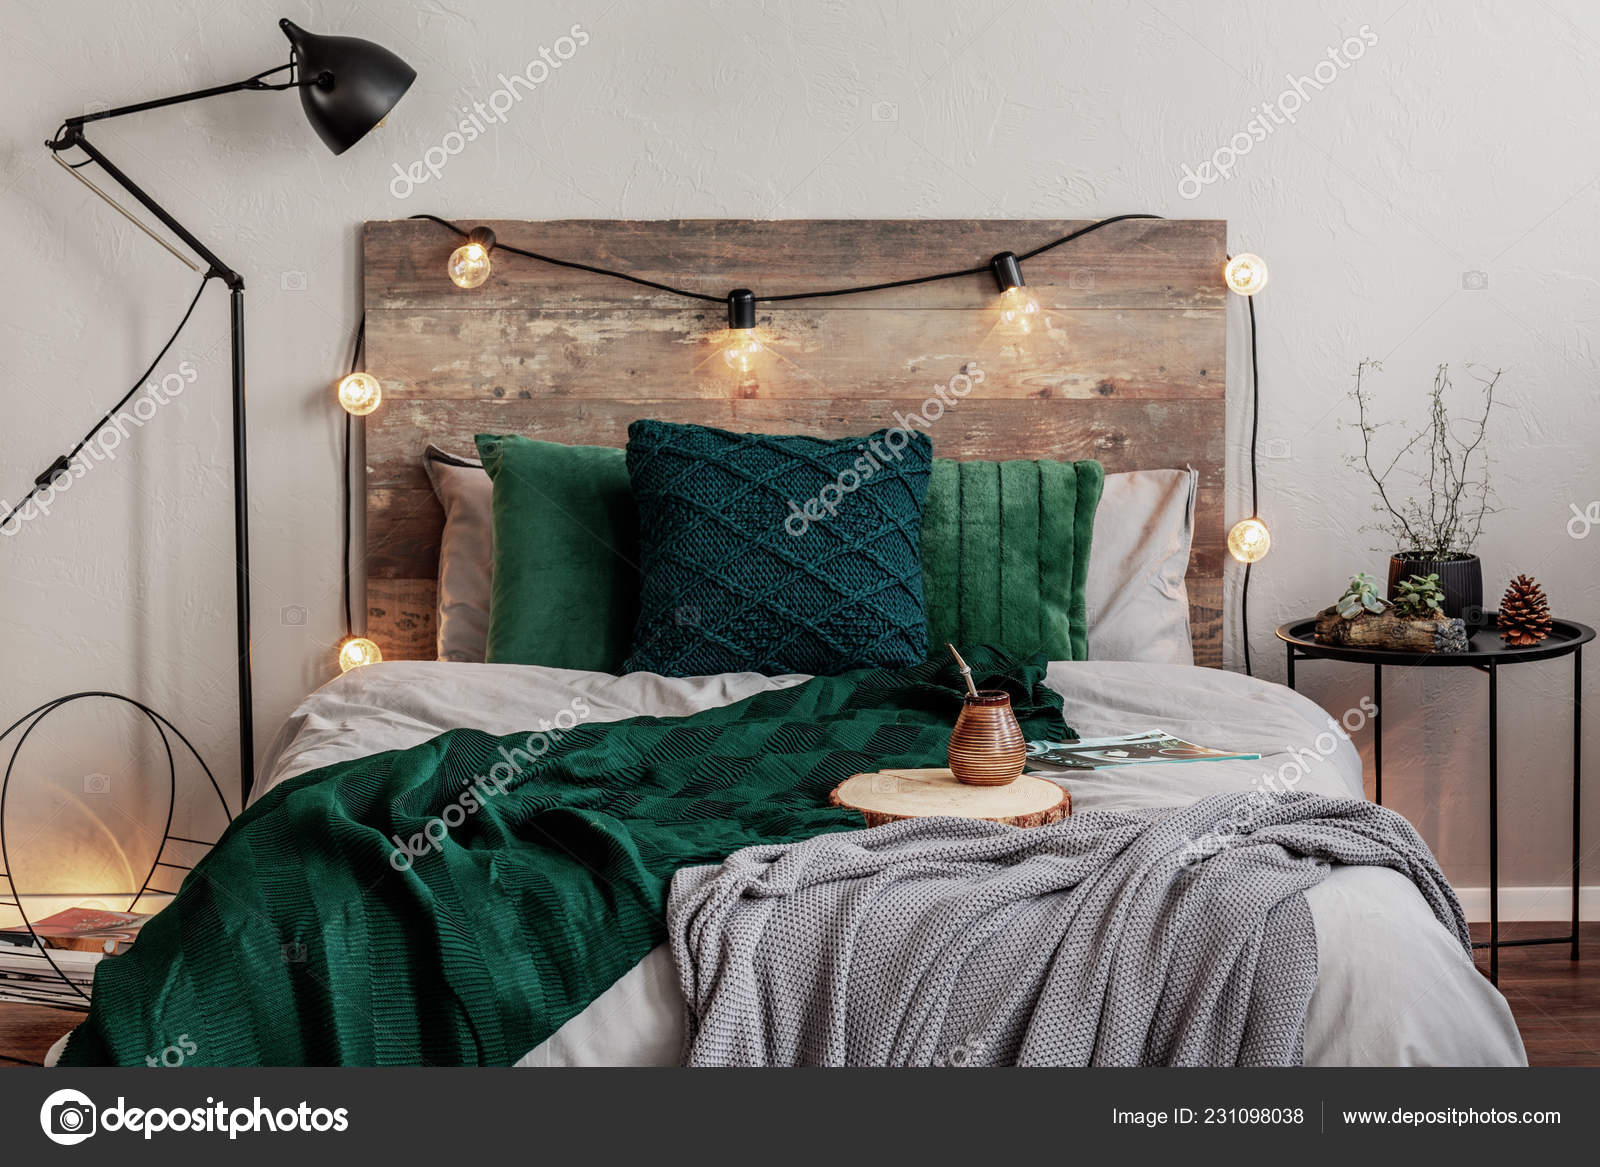 Emerald Green Grey Bedding Double Bed Wooden Headboard